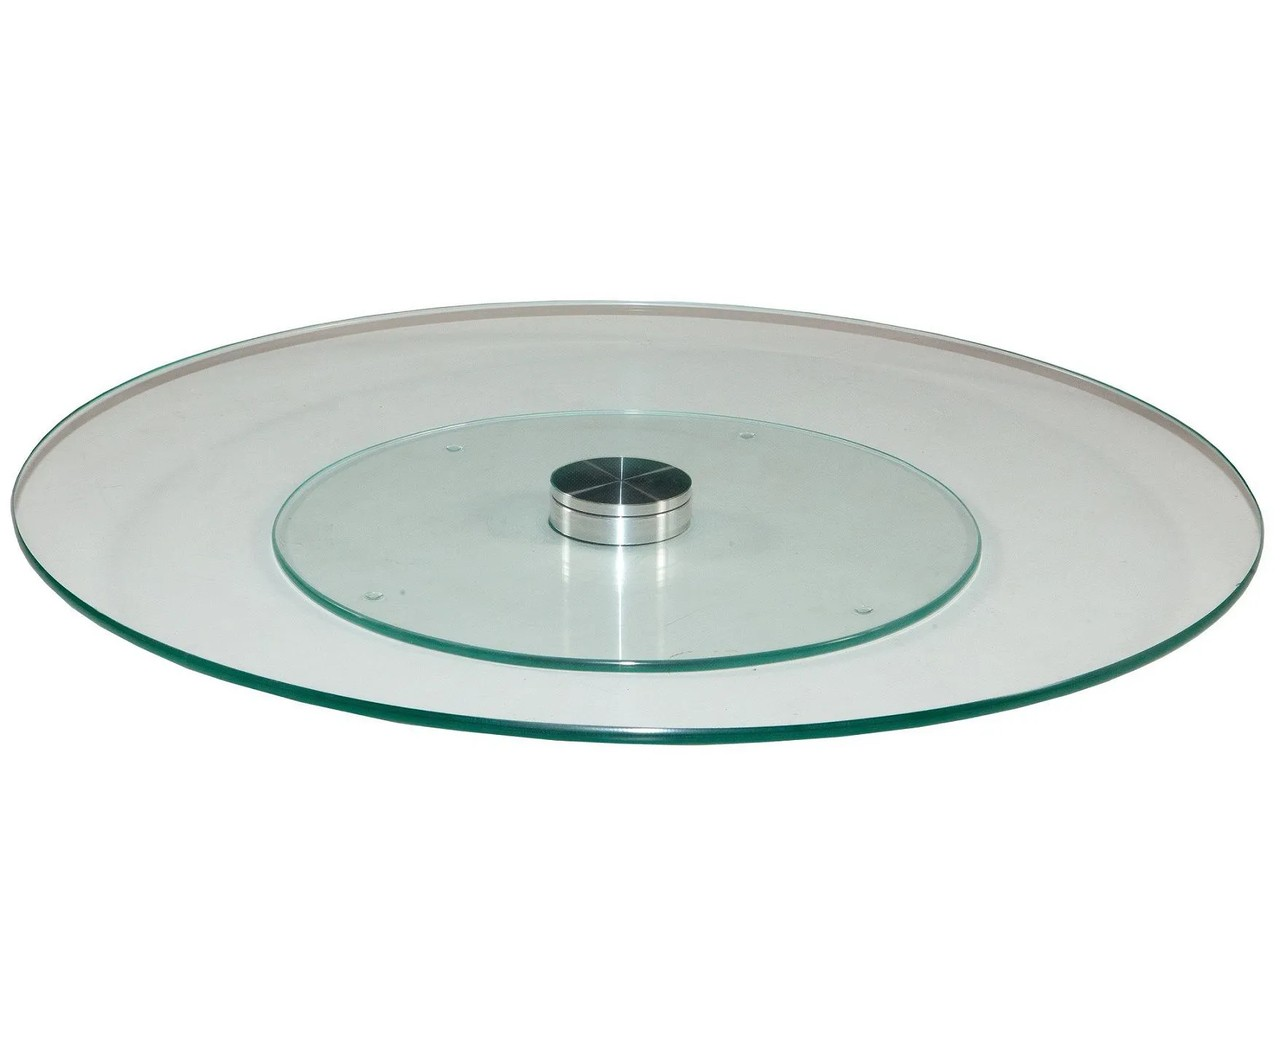 Centro de mesa Prato Giratório de 70 cm incolor